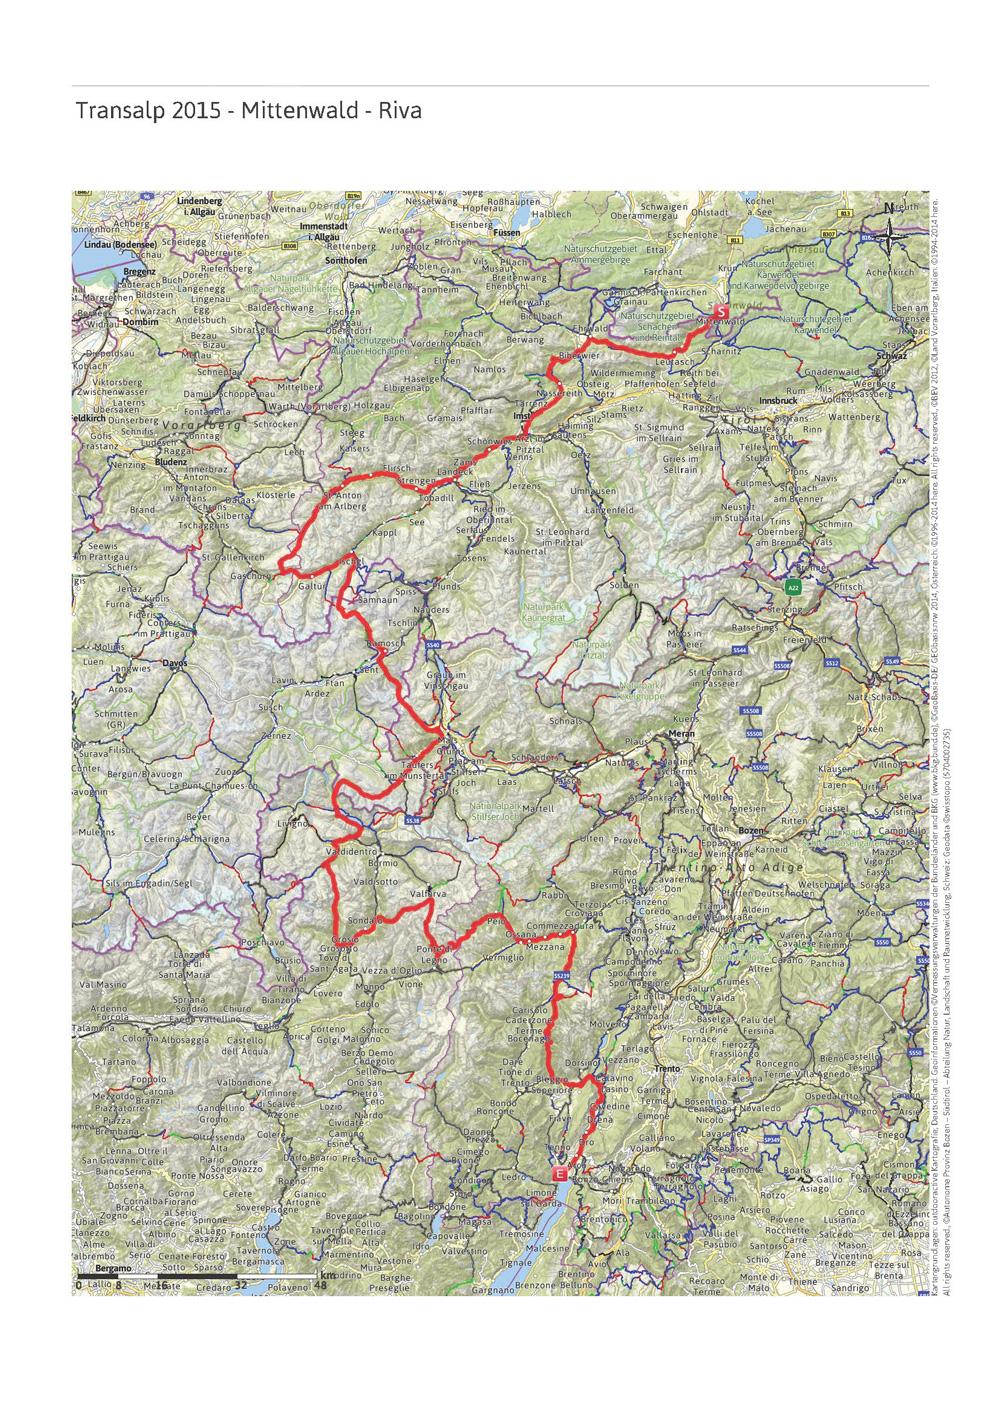 Transalp 2015 - Gesamte Route